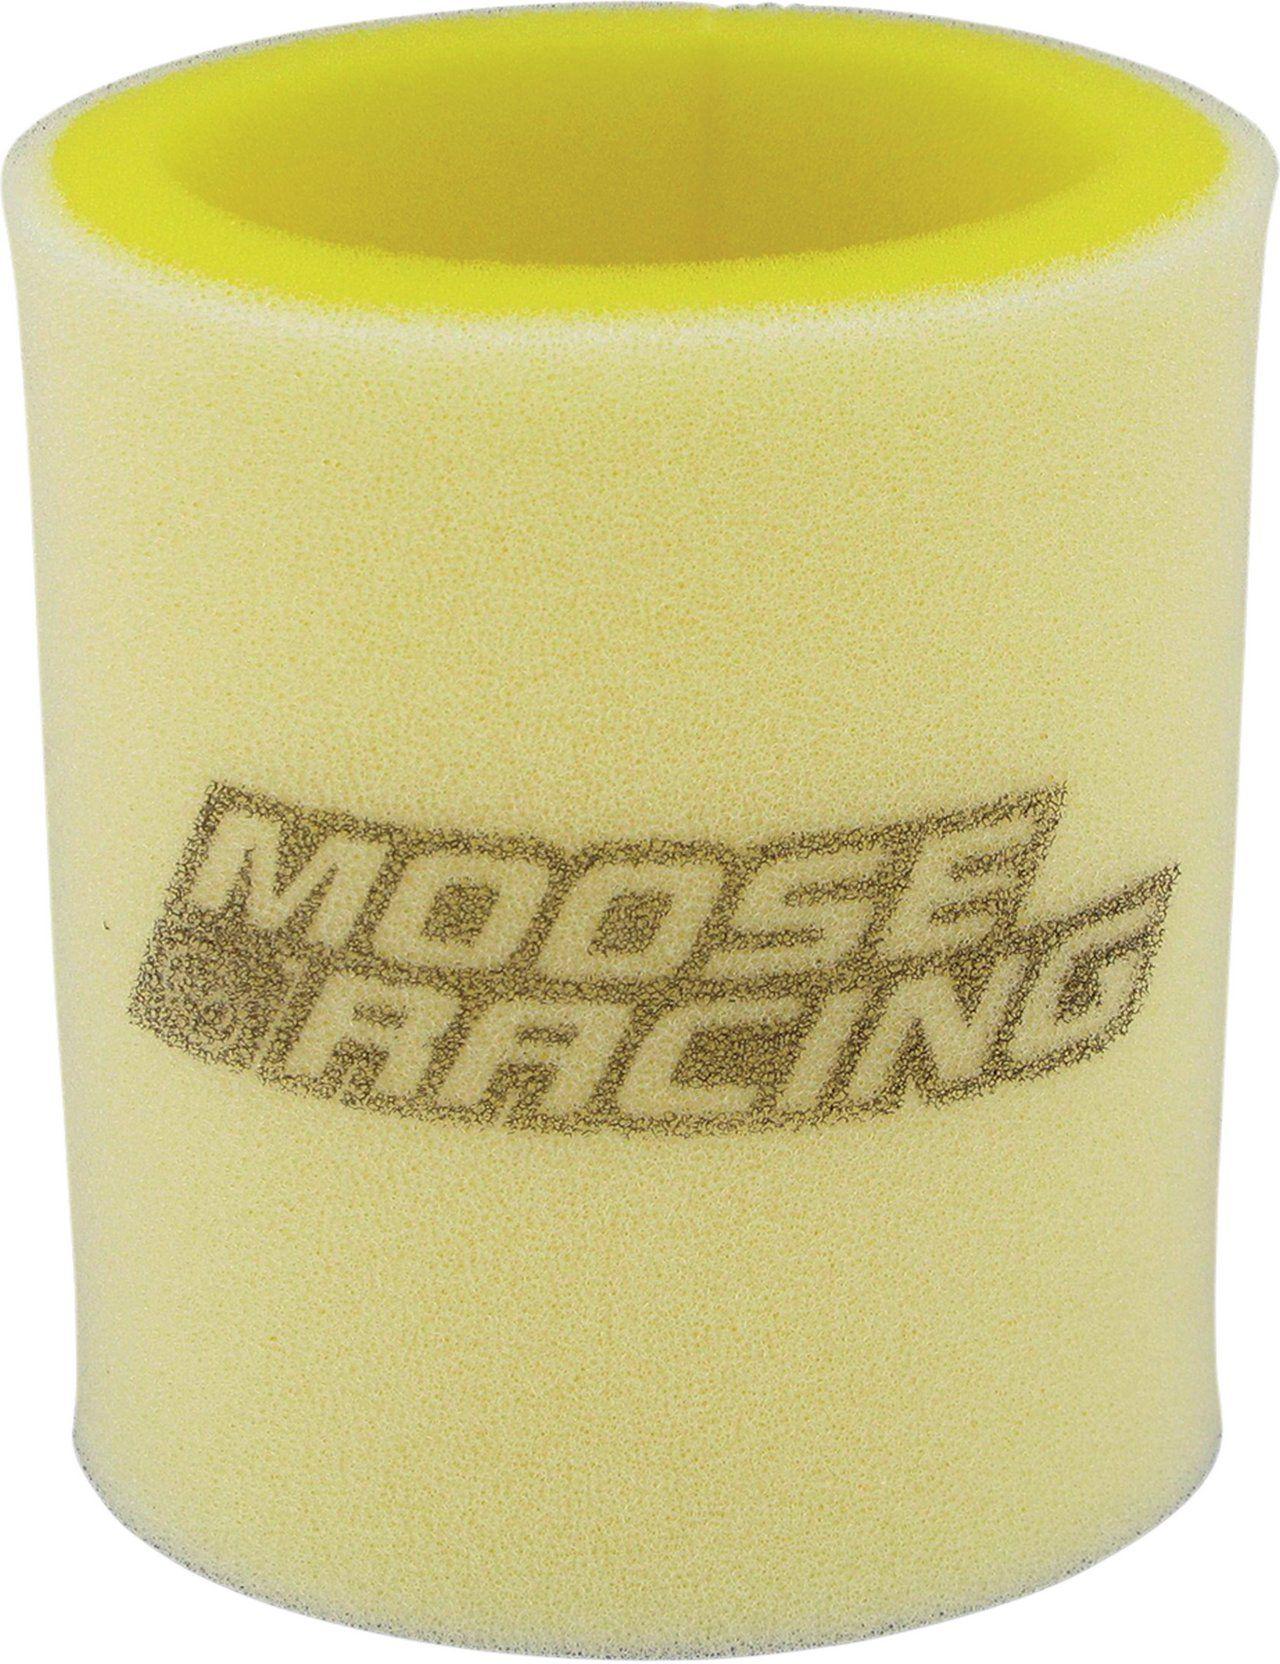 【MOOSE RACING】PPO (PRECISION PRE-OILED) 空氣濾芯 [M763-80-13] - 「Webike-摩托百貨」